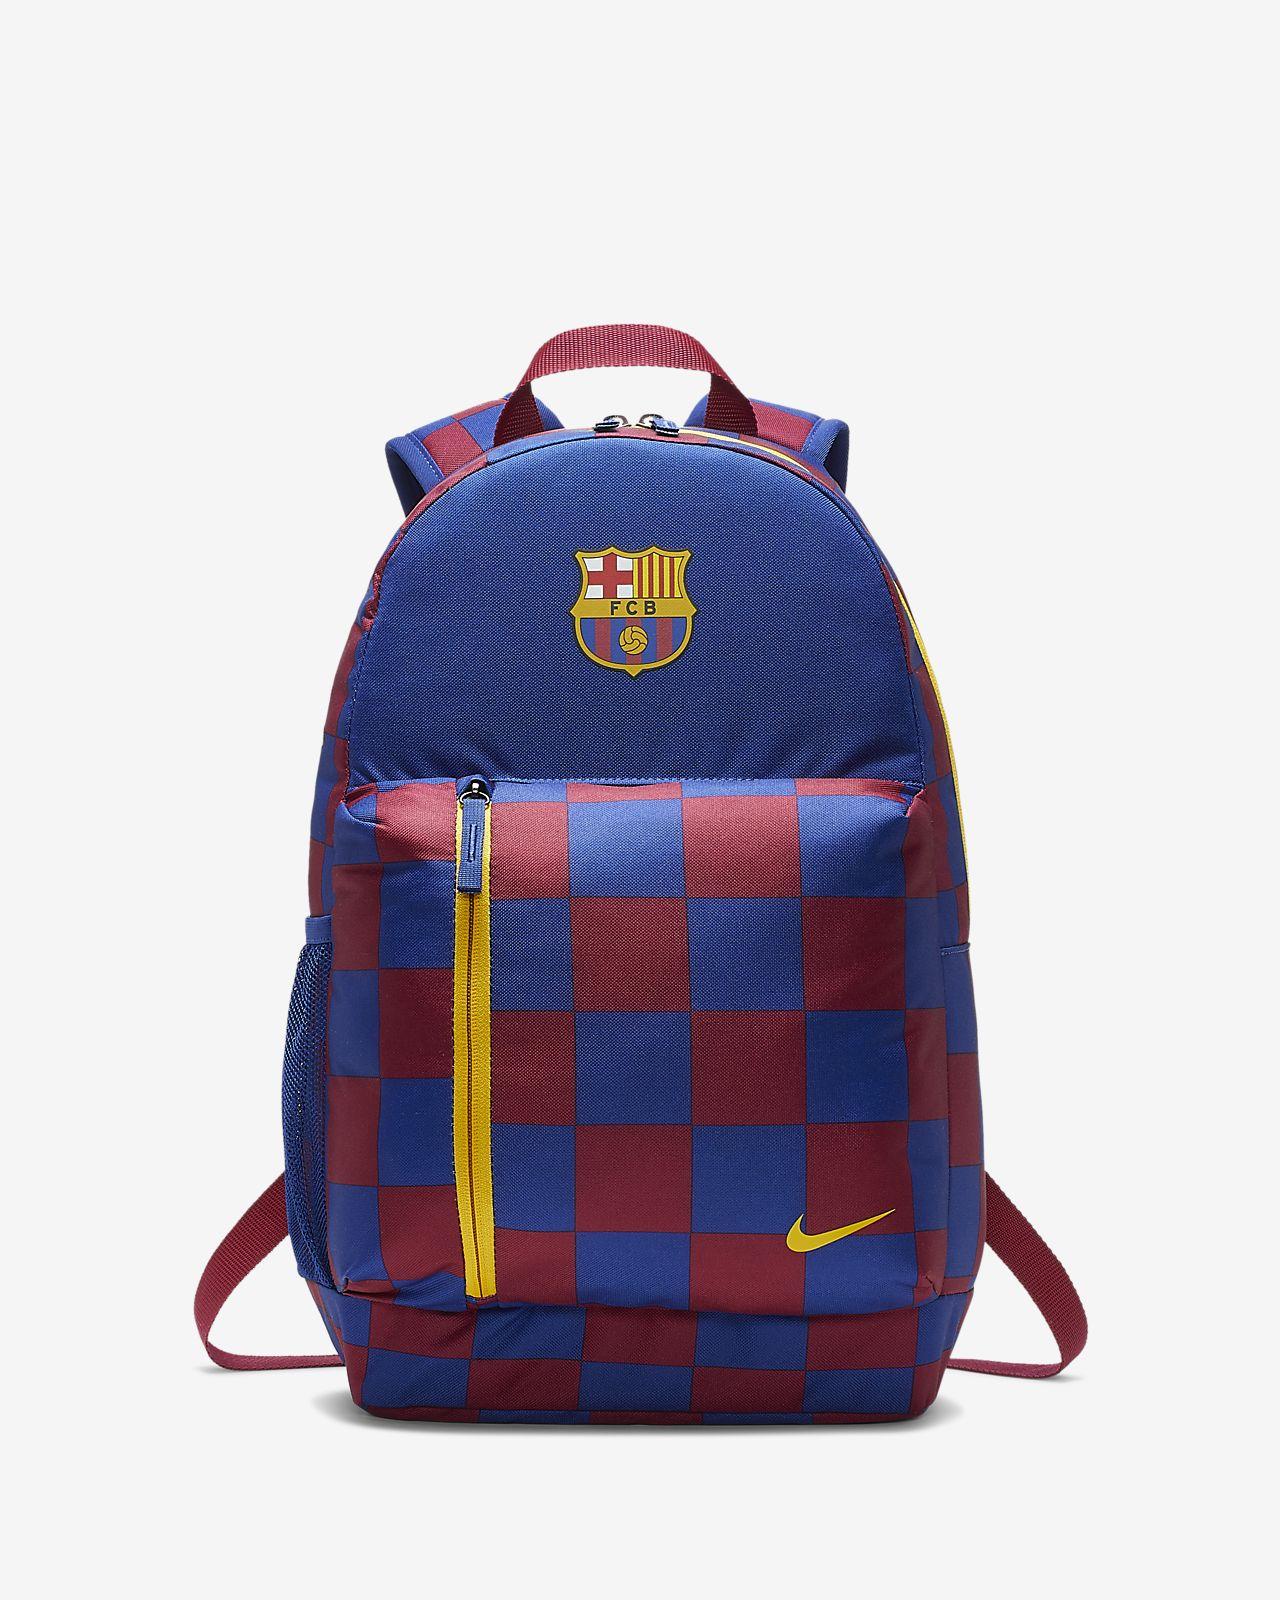 FC Barcelona Stadium Motxilla de futbol - Nen/a